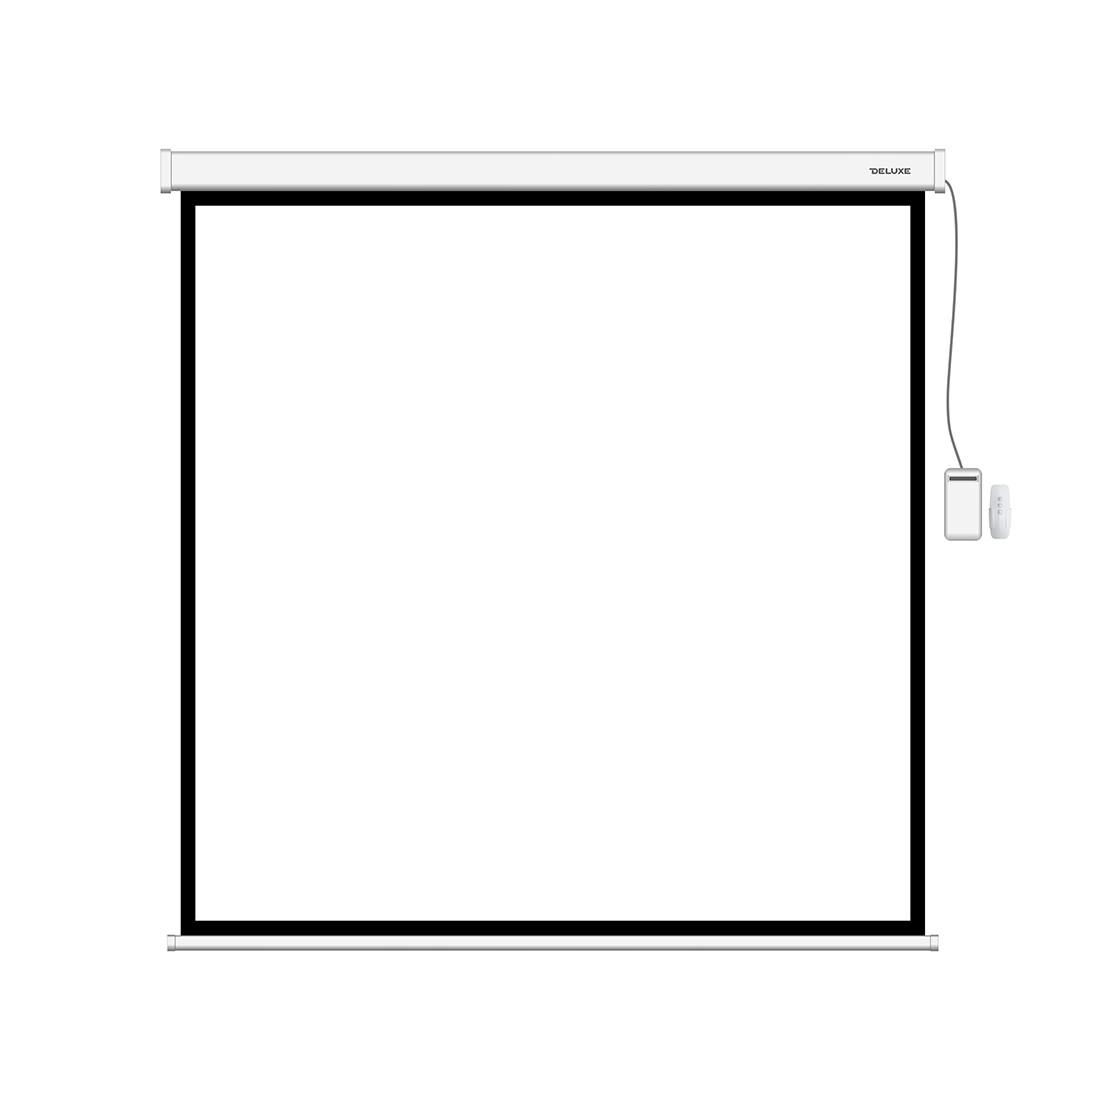 "Экран моторизированный (с пультом Д/У) Deluxe DLS-ERC203x153W (80""х60""), Ø - 100"", 4:3"